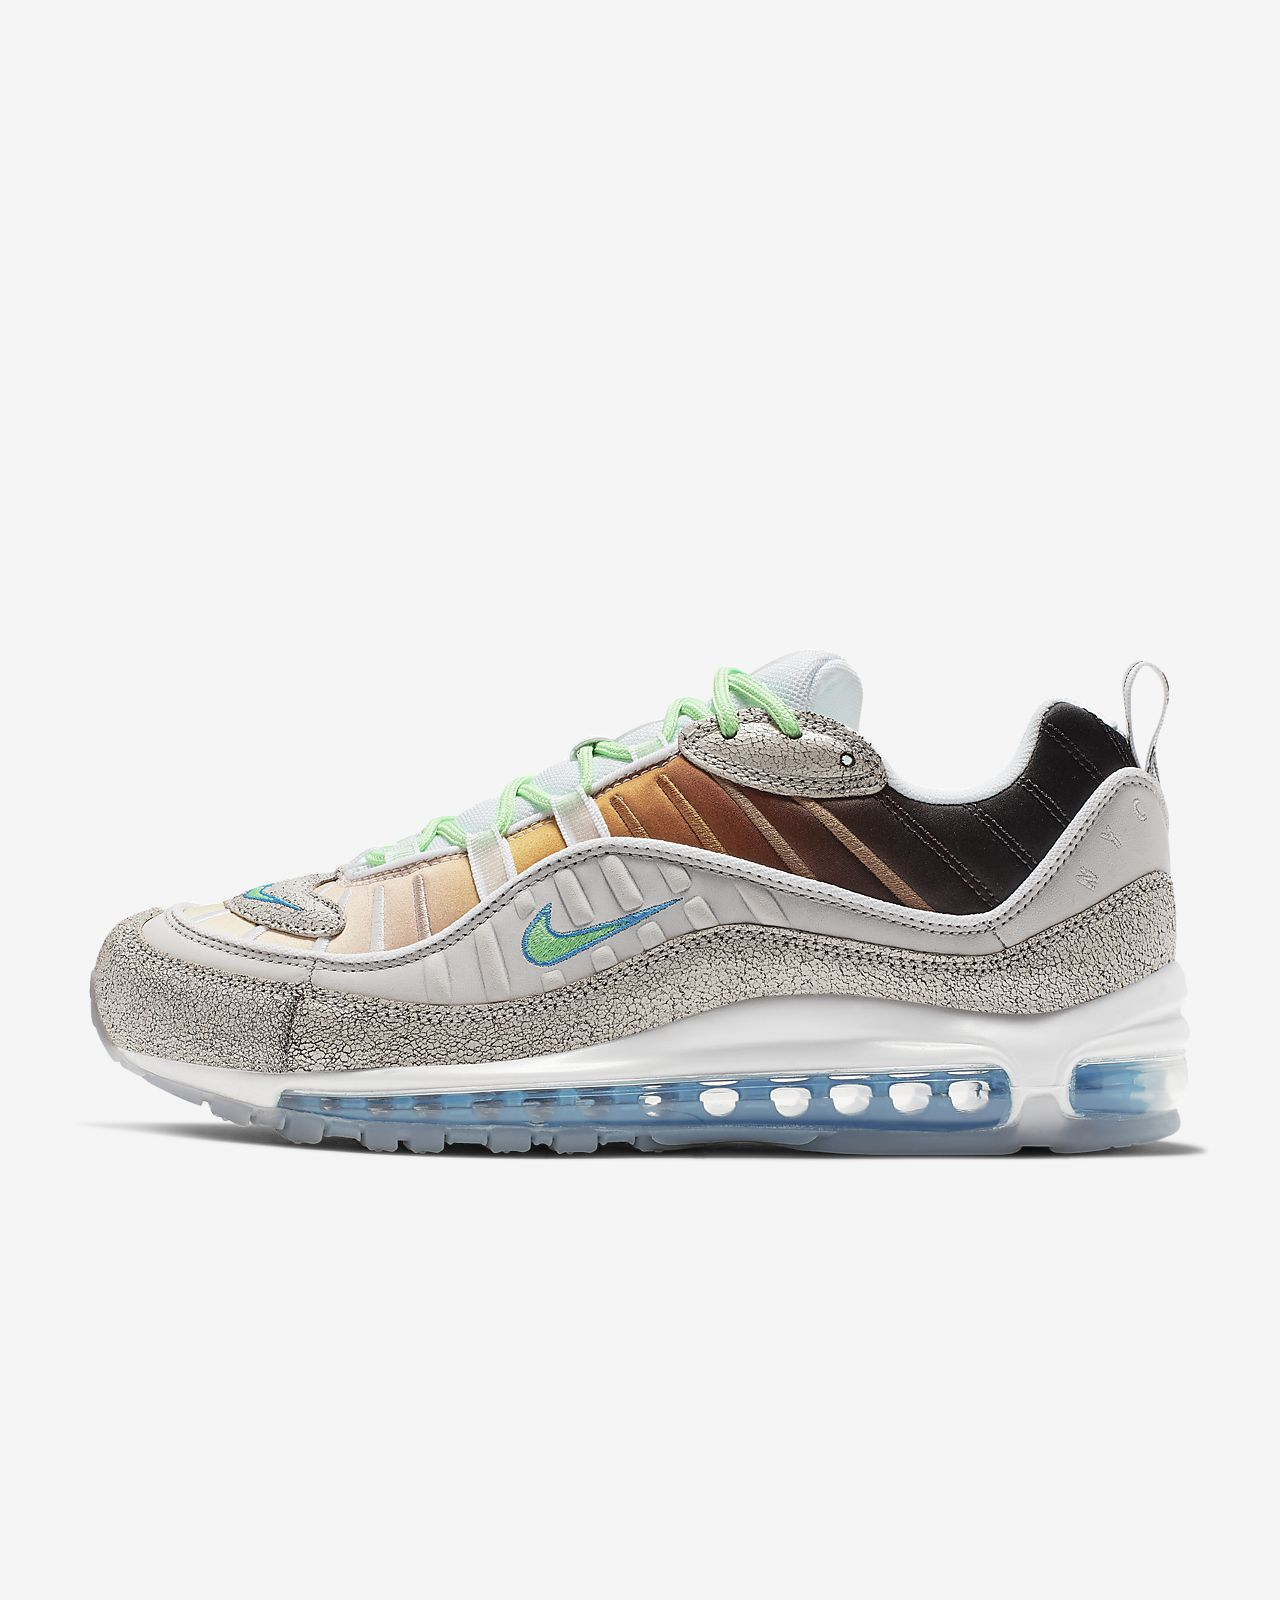 Nike Air Max 98 OA GS男子运动鞋